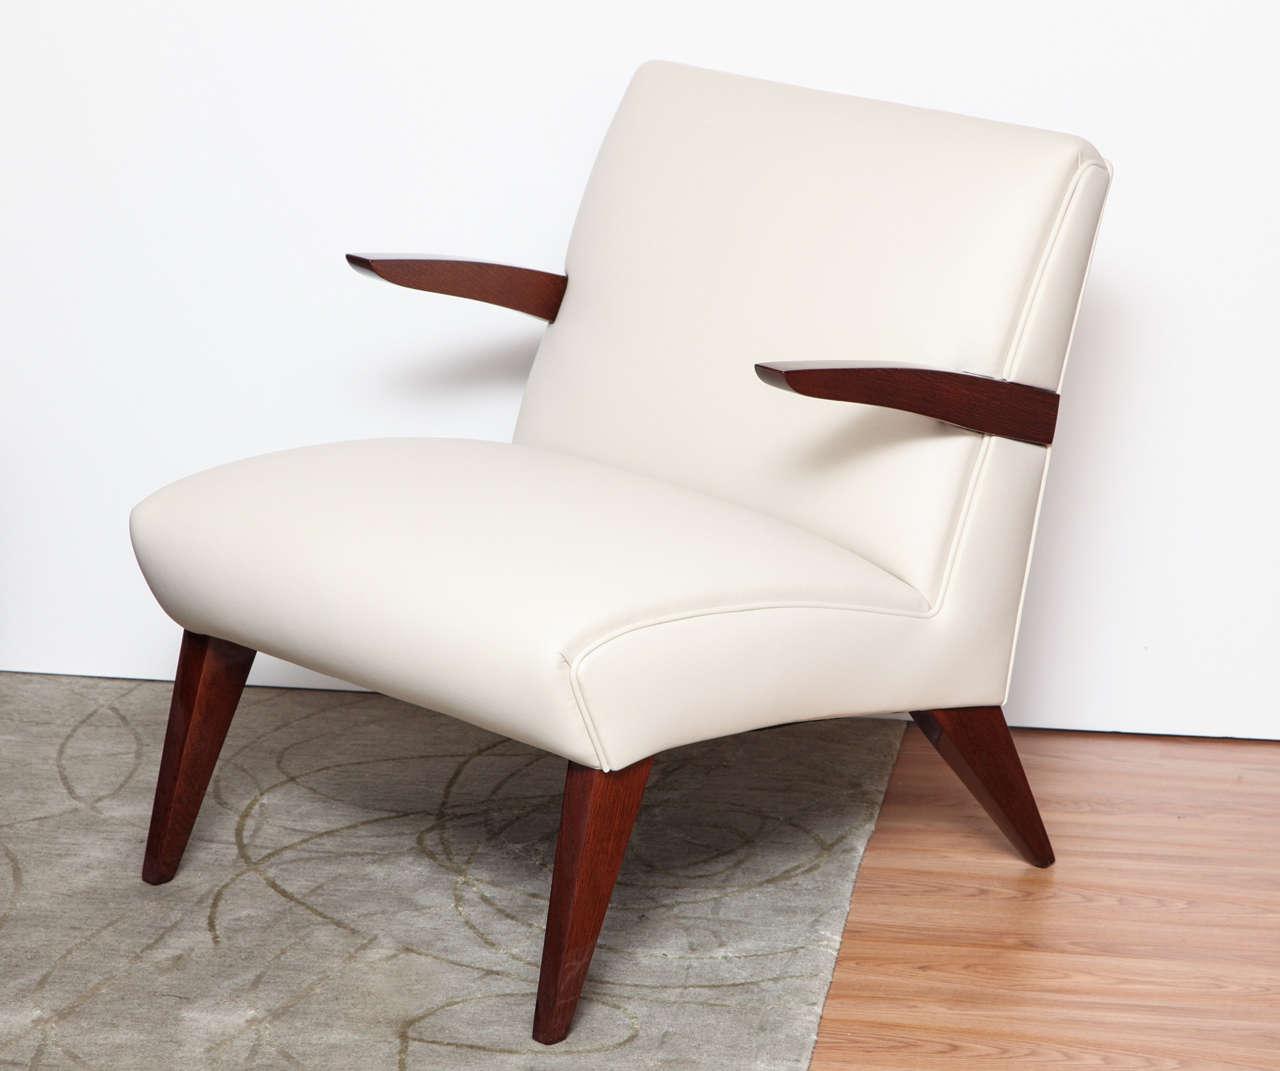 Pair of Art Deco Streamline Lounge Chairs 2